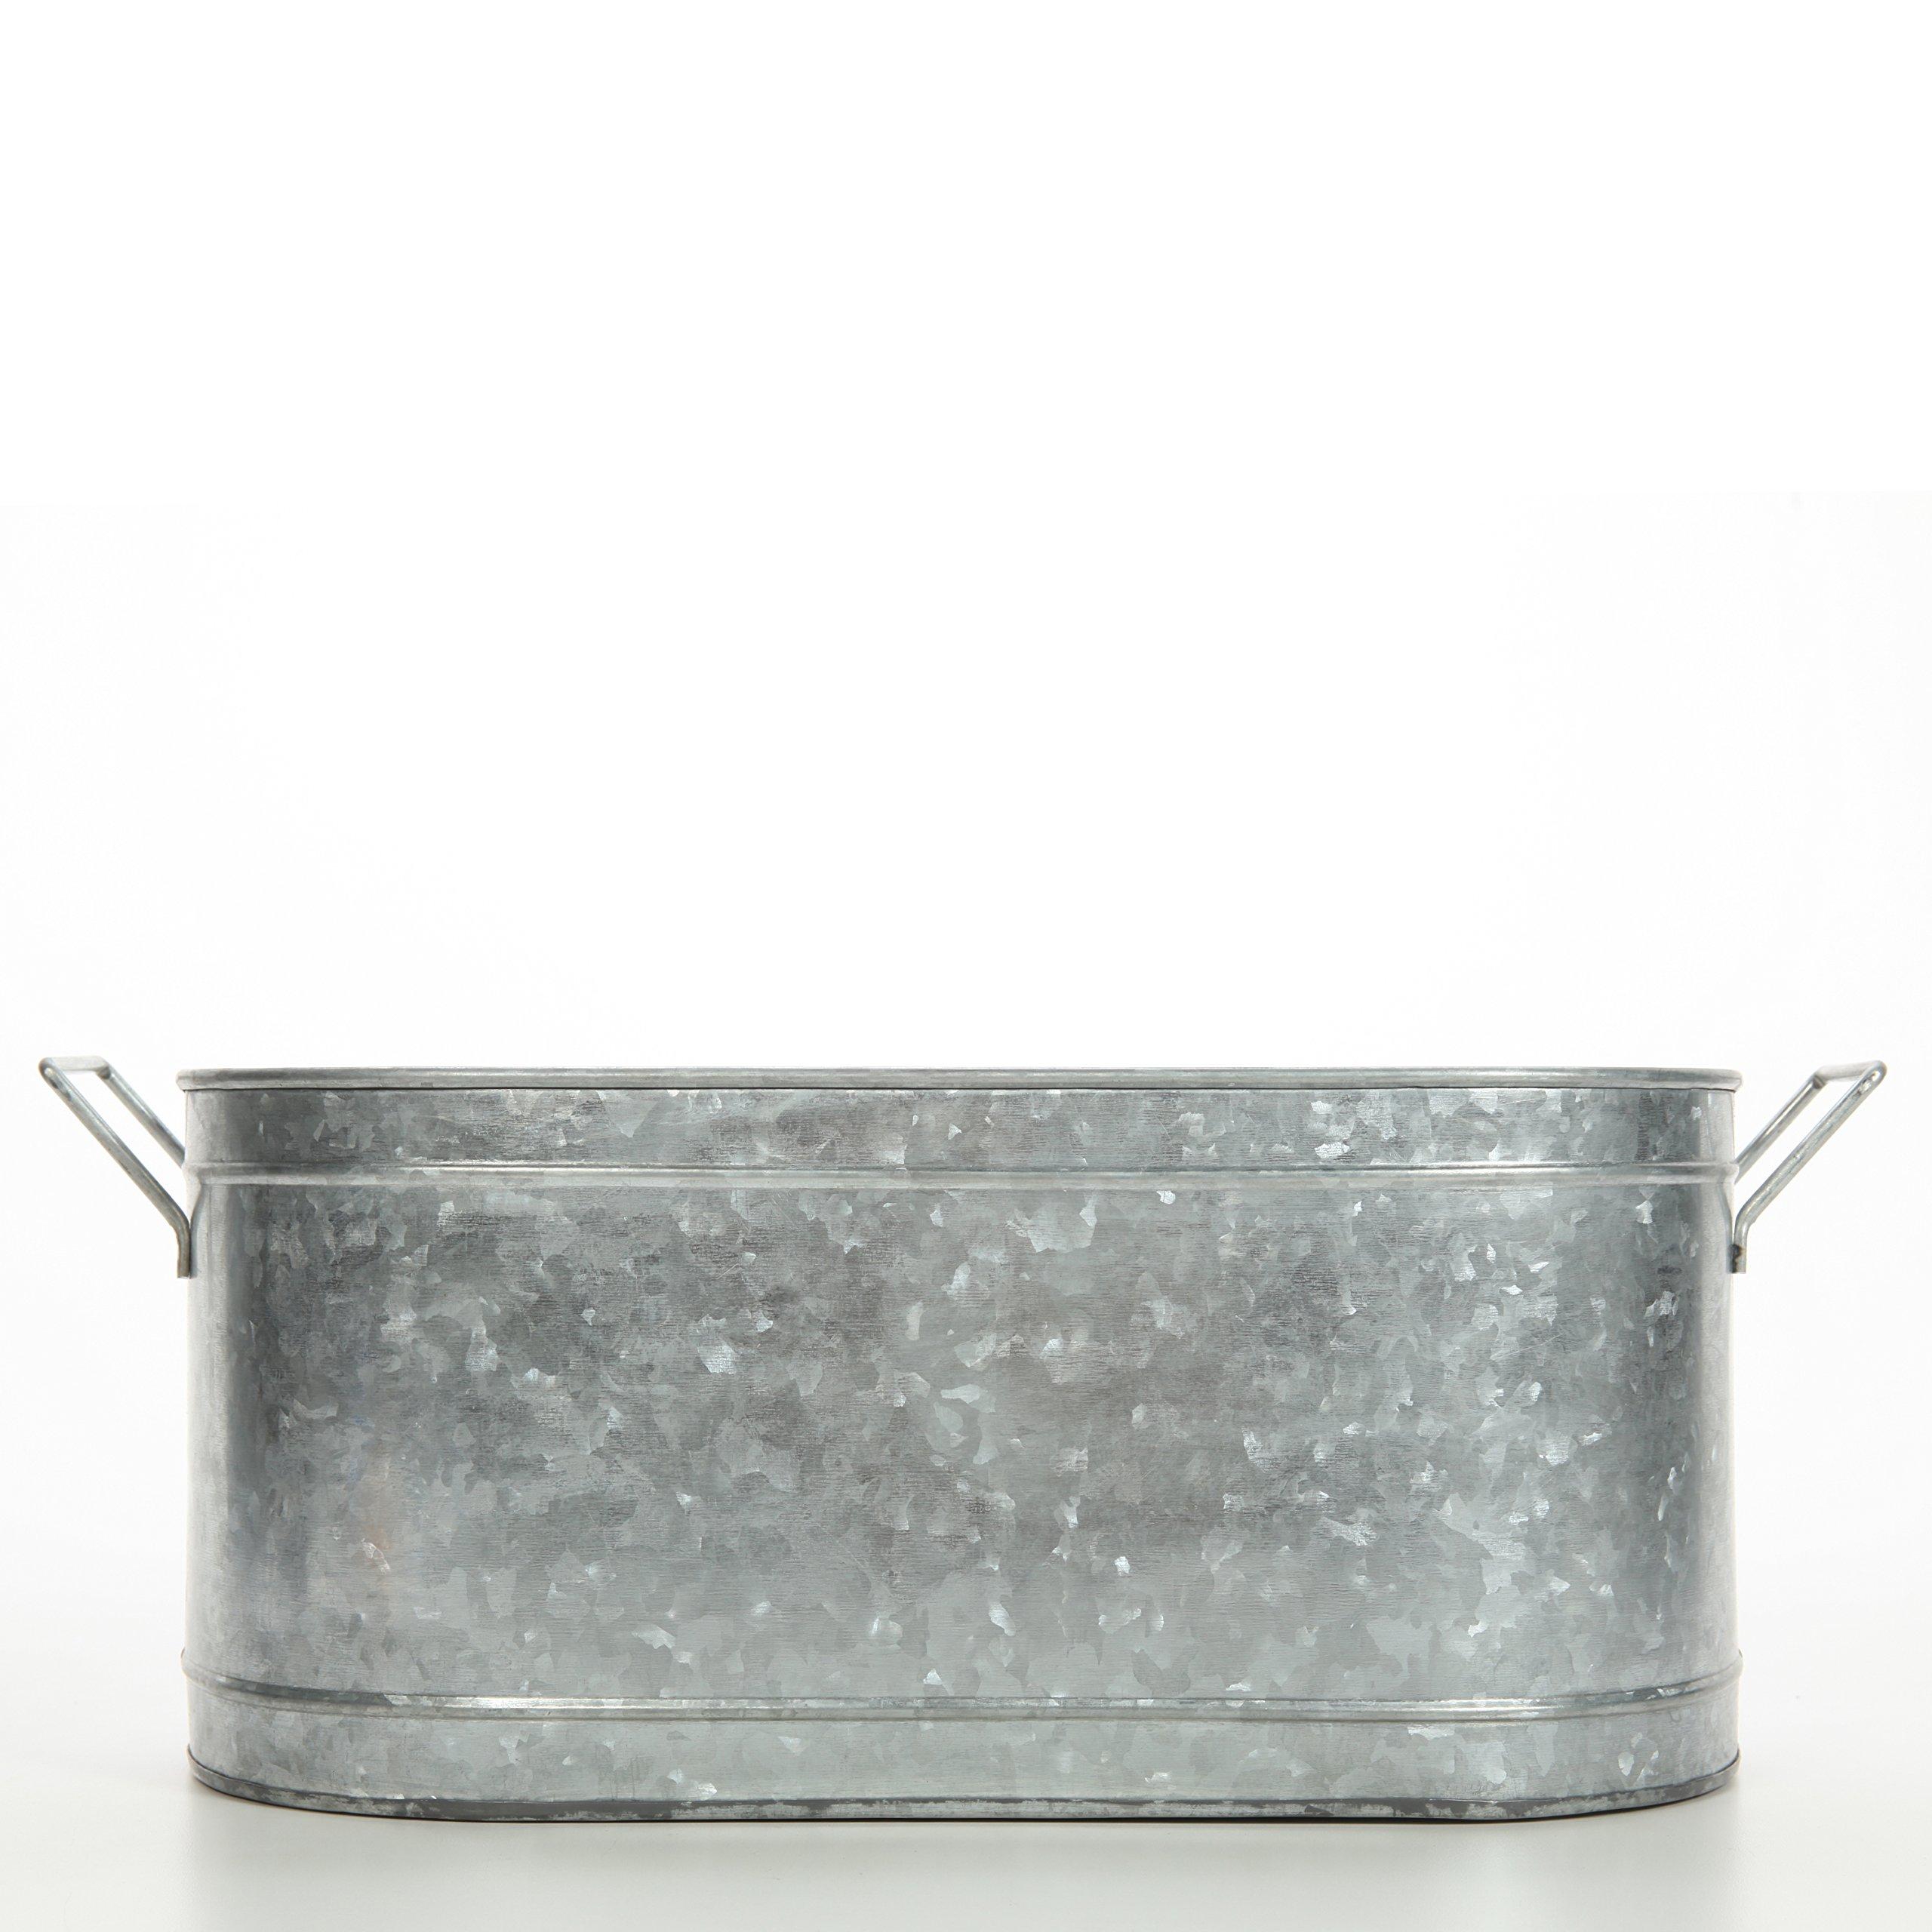 Hosley's 18'' Long Galvanized Oval Beverage Party Tub, Chiller. Garden Planter; Serveware. Ideal for Patio, Garden O3